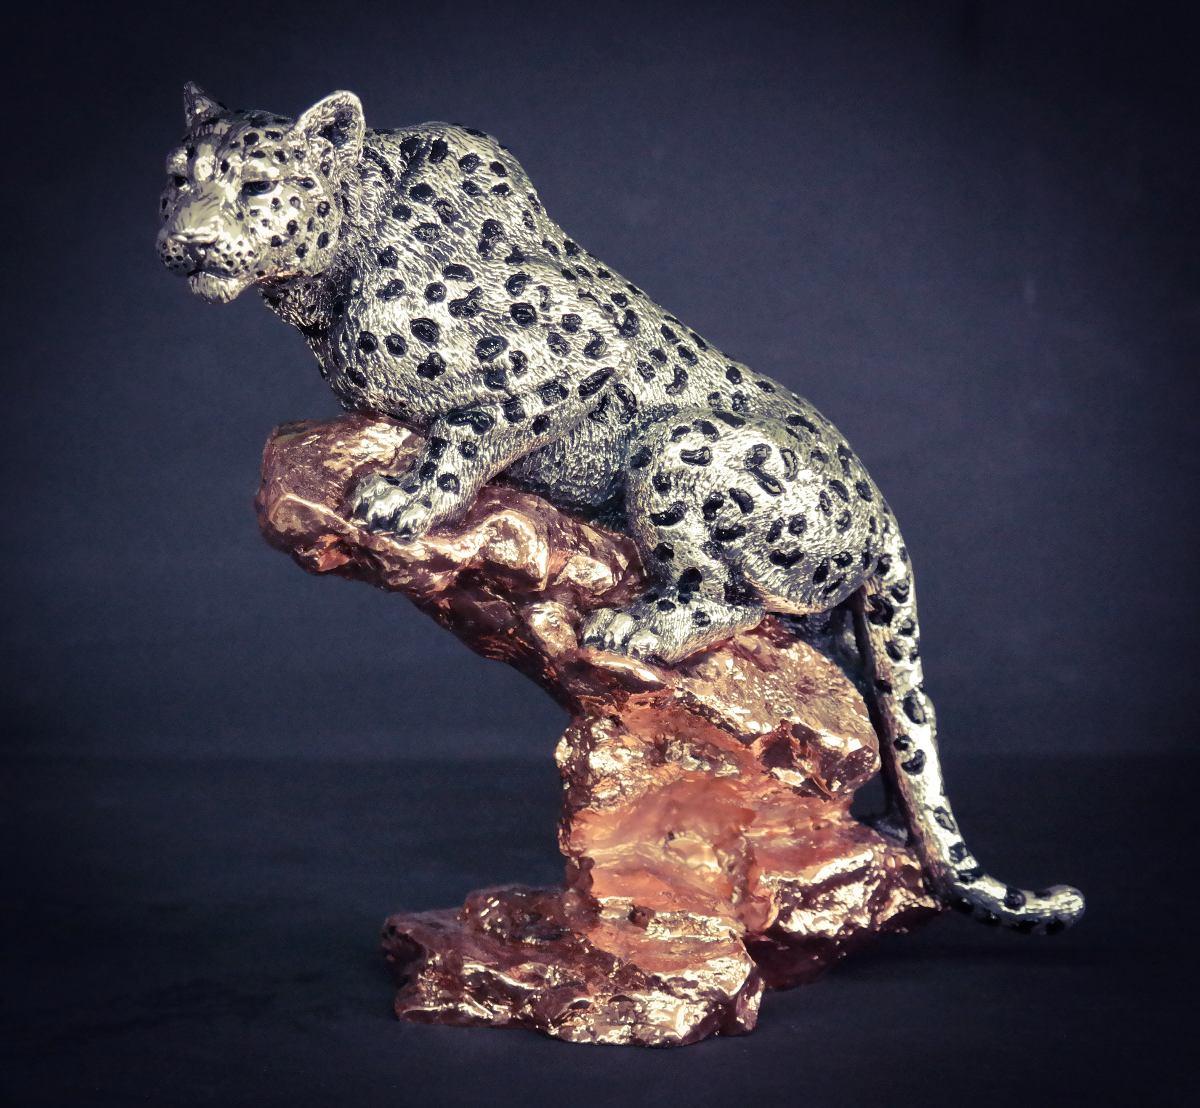 Escultura Leopardo Plata Electroformado Figura Decorativa - Escultura-decorativa